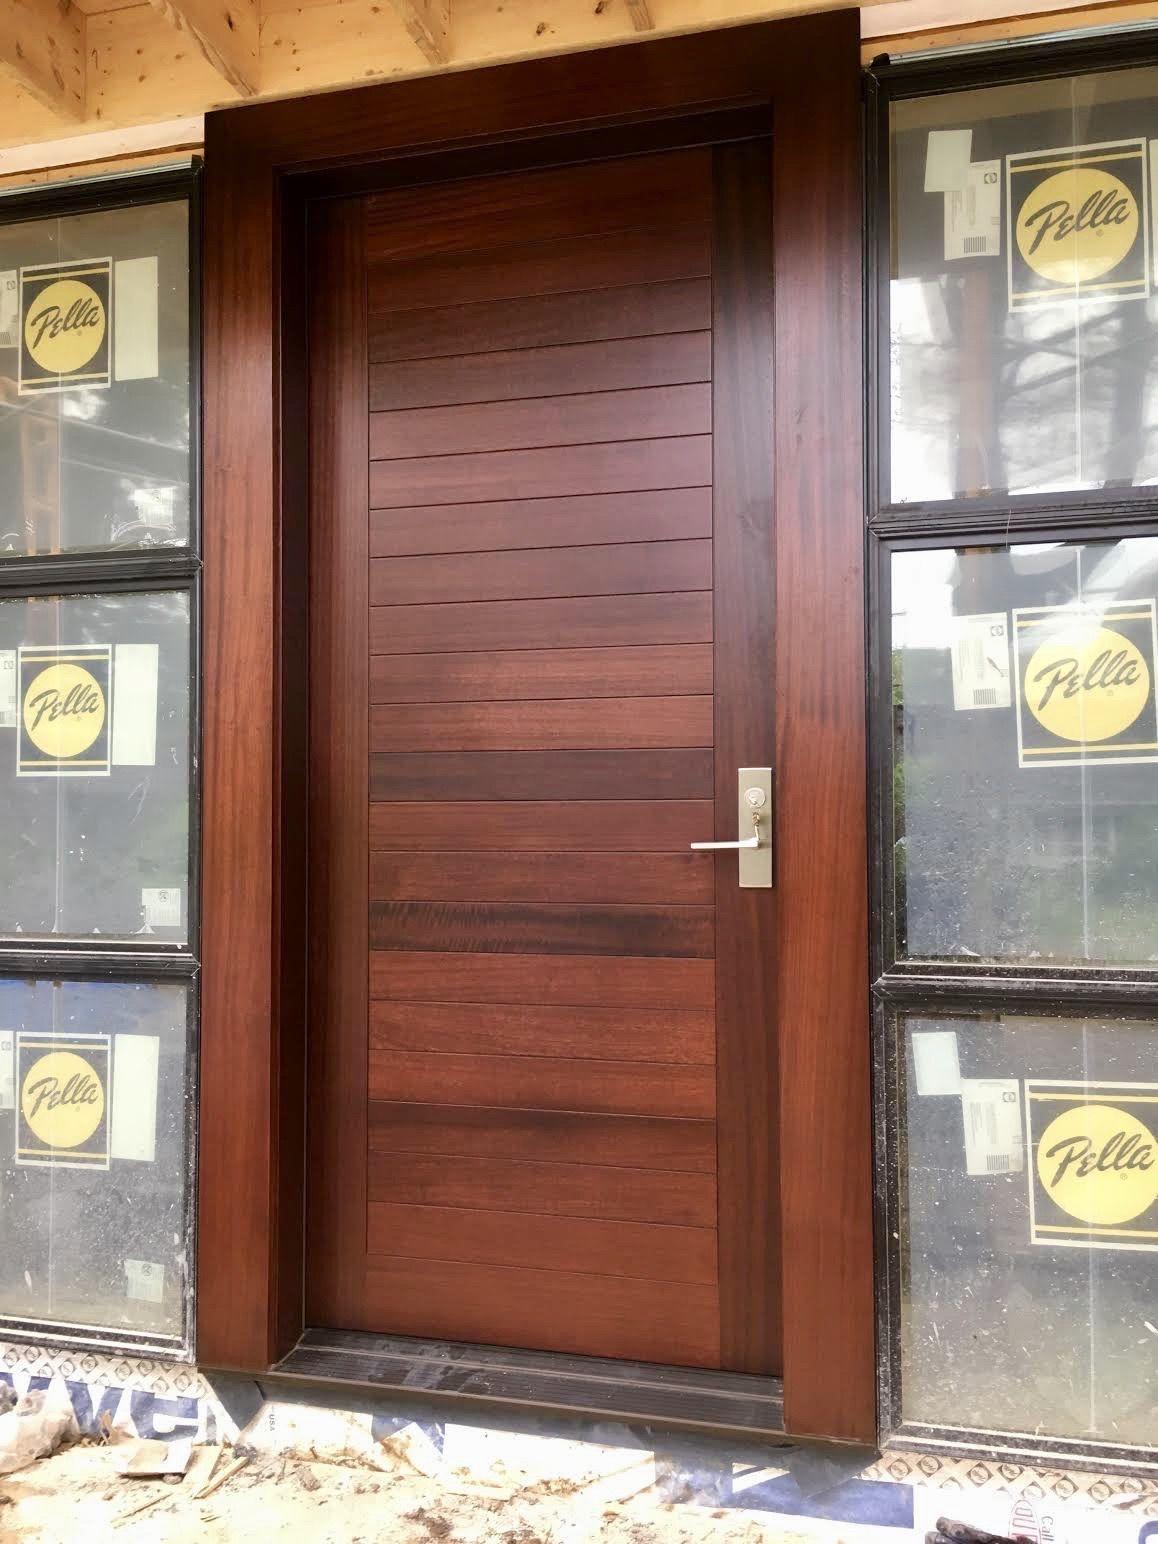 Amberwood Doors Inc: *NEW CONSTRUCTION* Features Stunning Contemporary